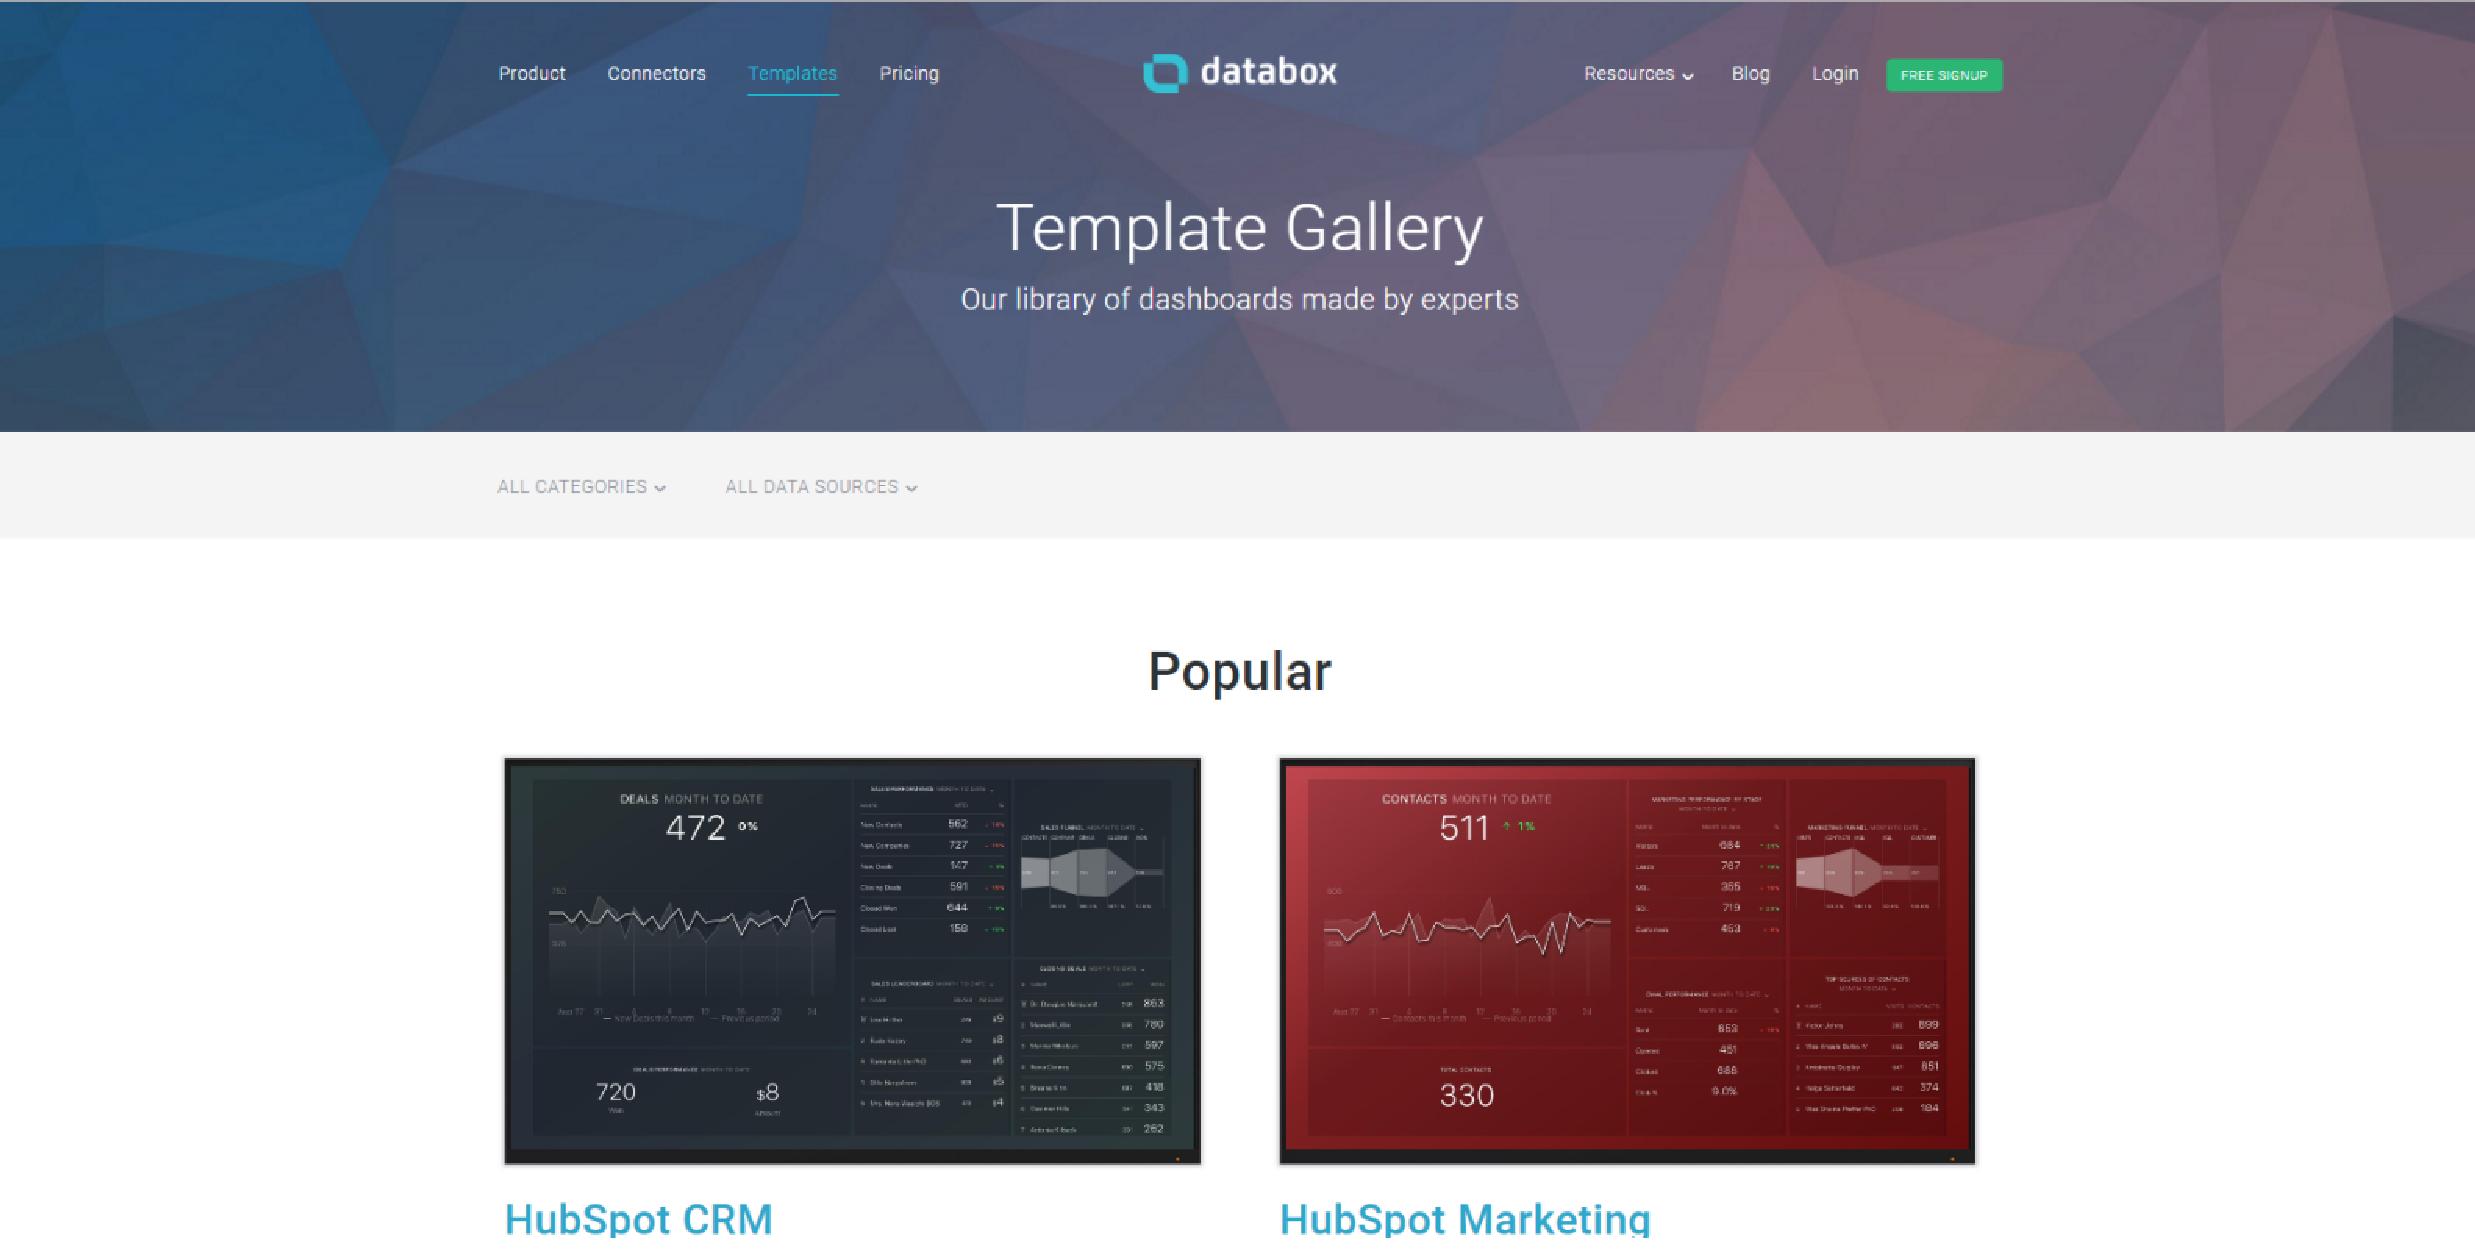 databox template gallery